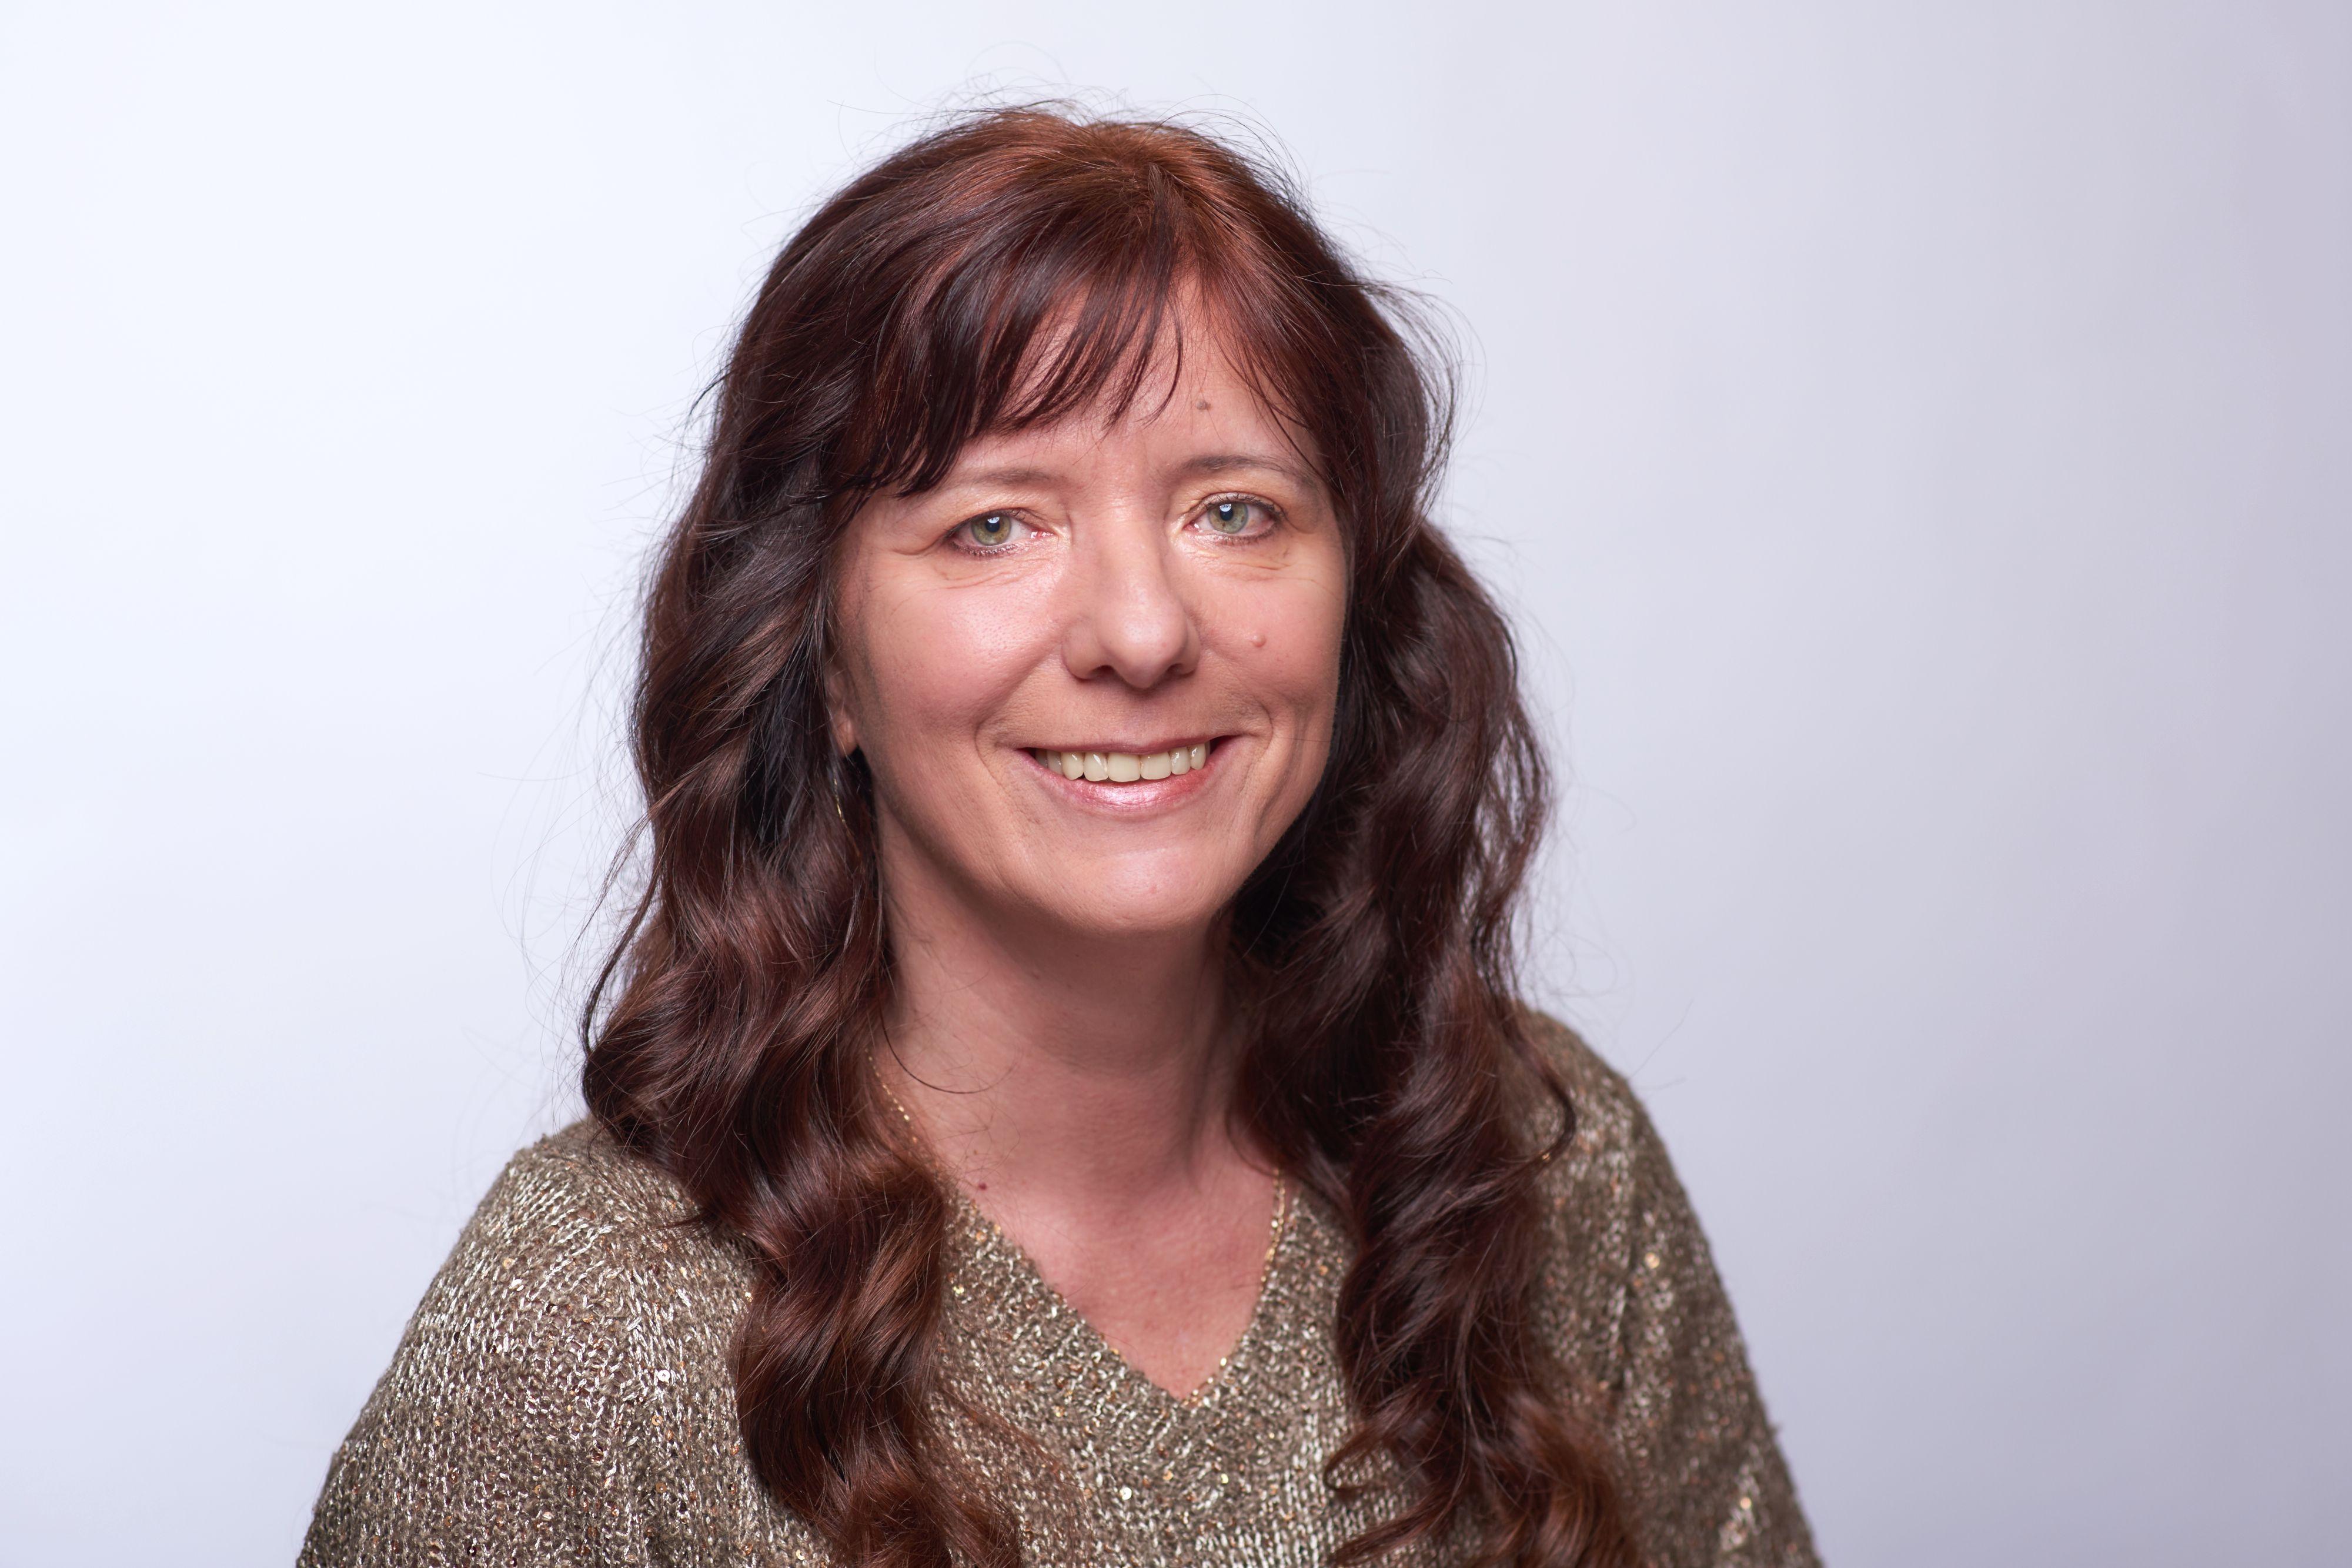 Birgit Kesper